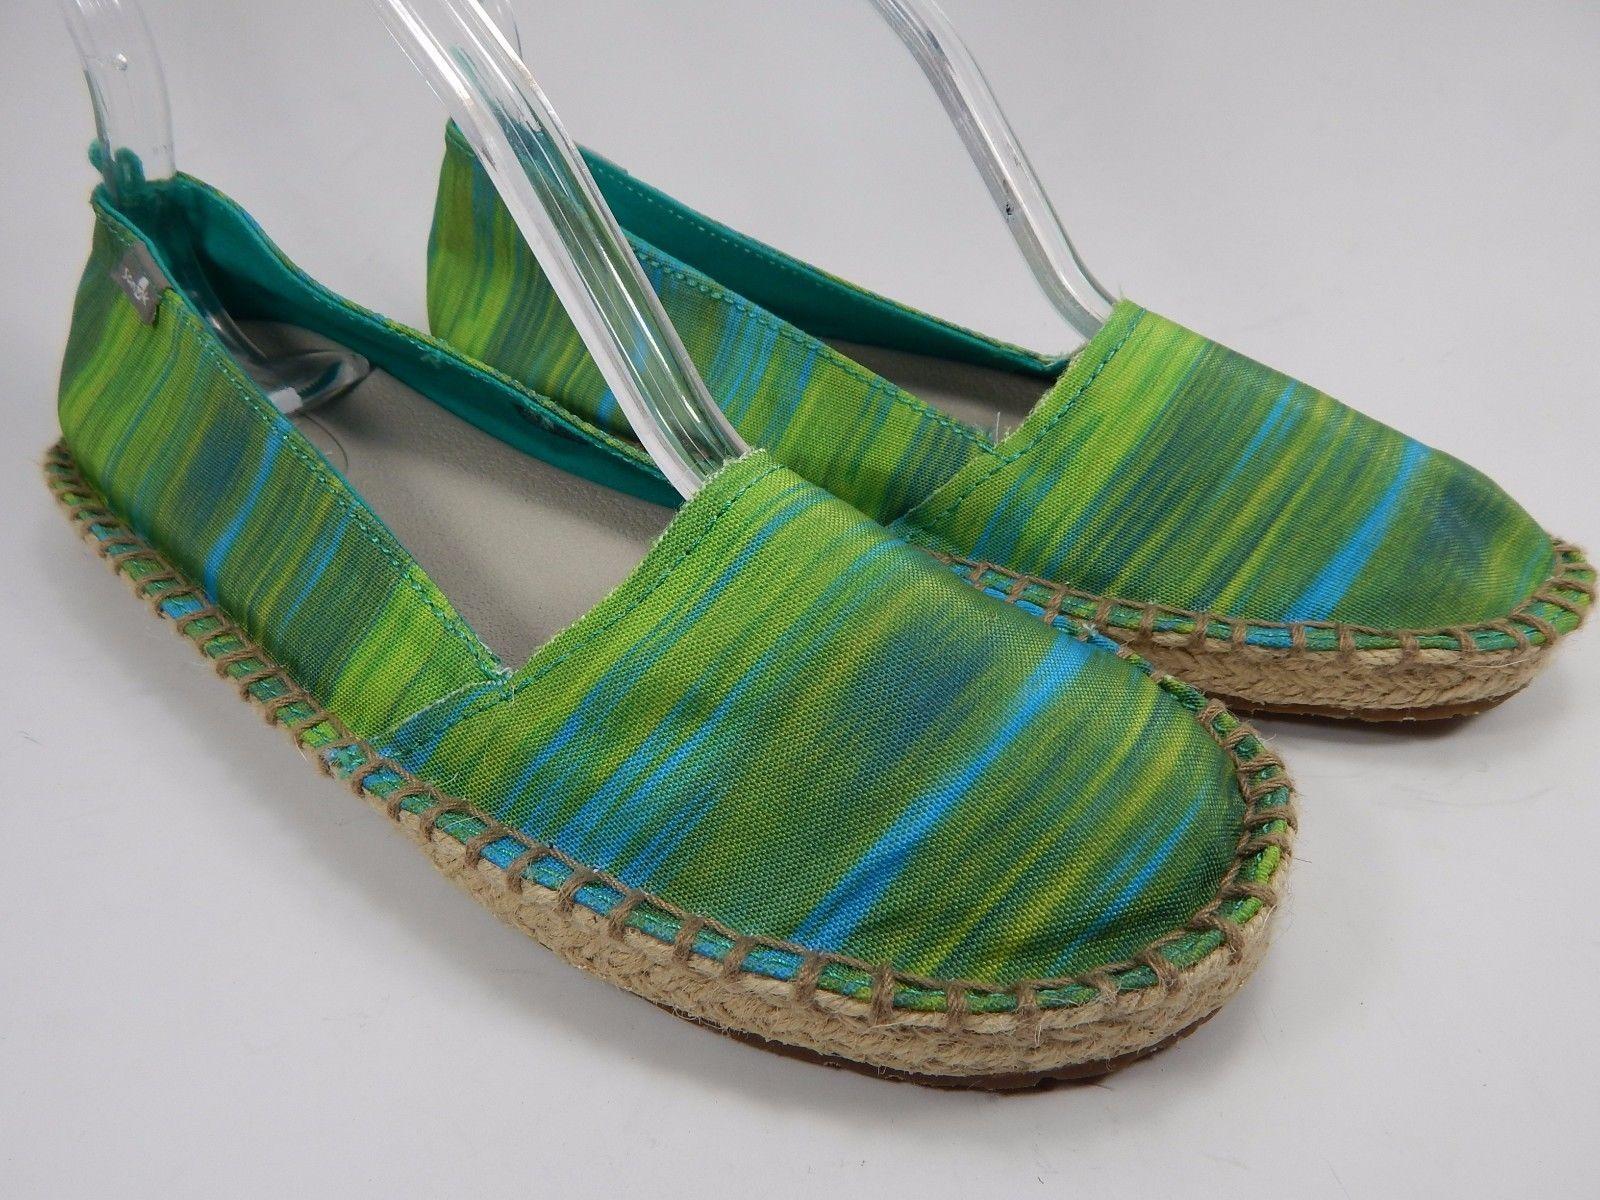 Sanuk Natal Blue / Ikat Green Women's Casual Sandals Shoes Size US 7 M (B)